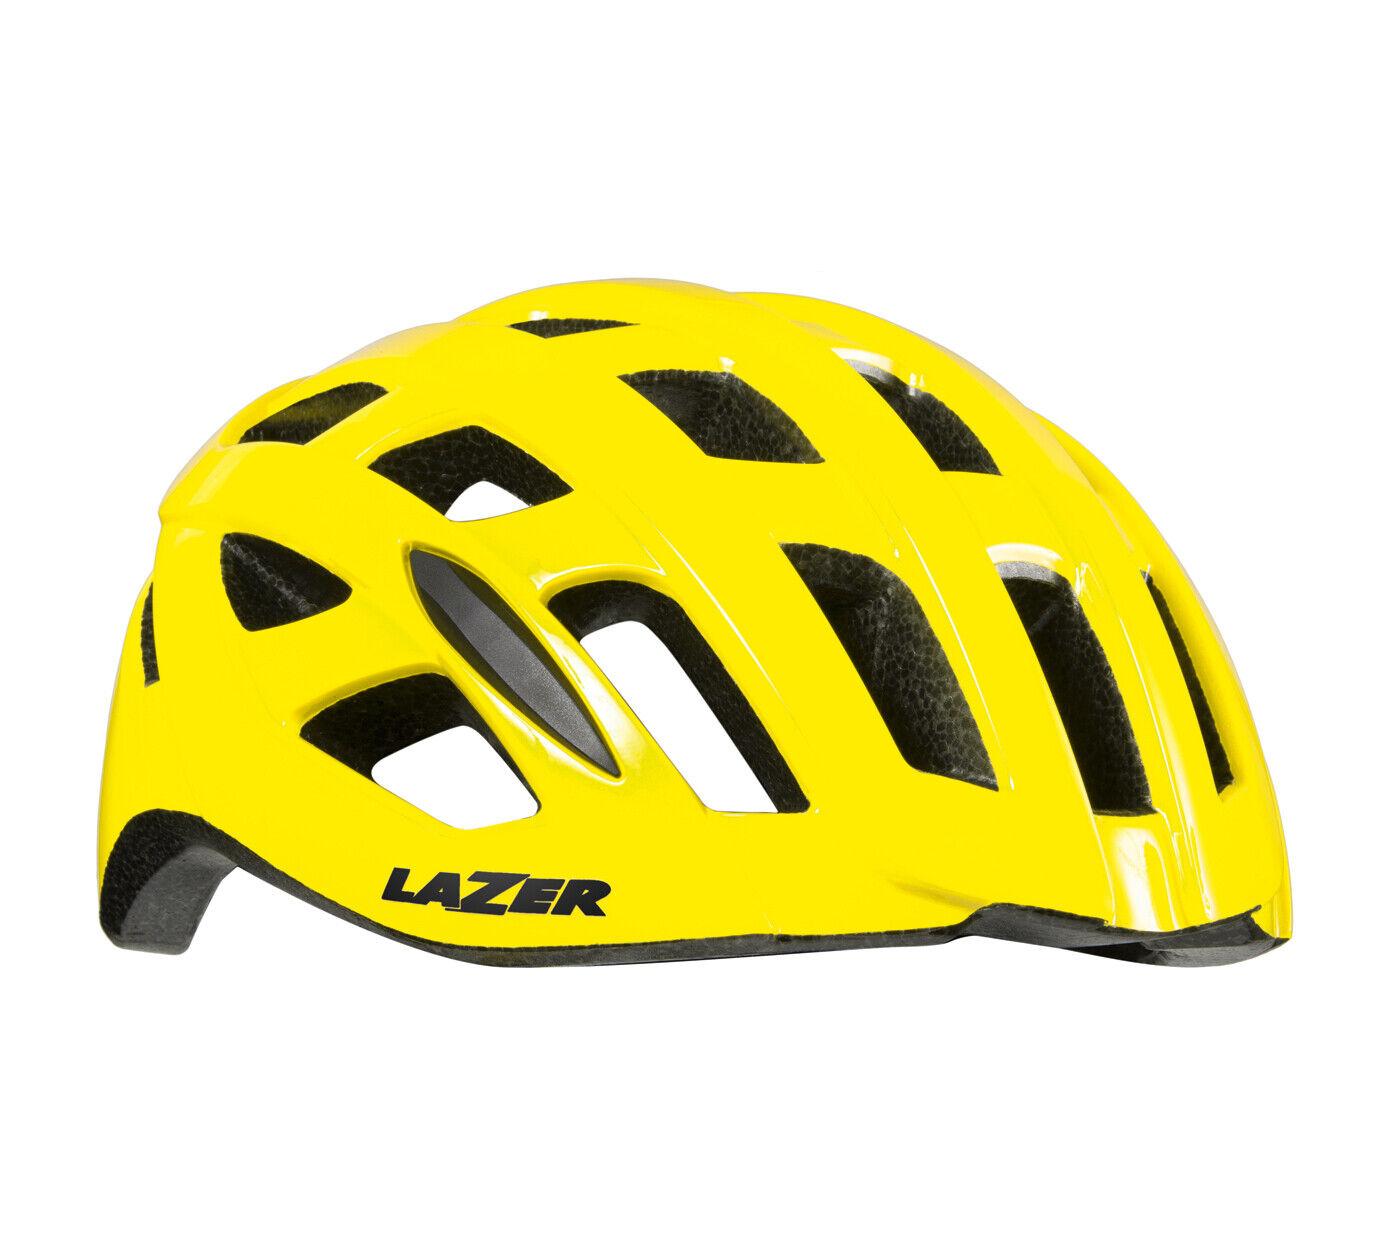 Lazer TONIC Road Cycling Bicycle Adult Bike Helmet   FLASH YELLOW